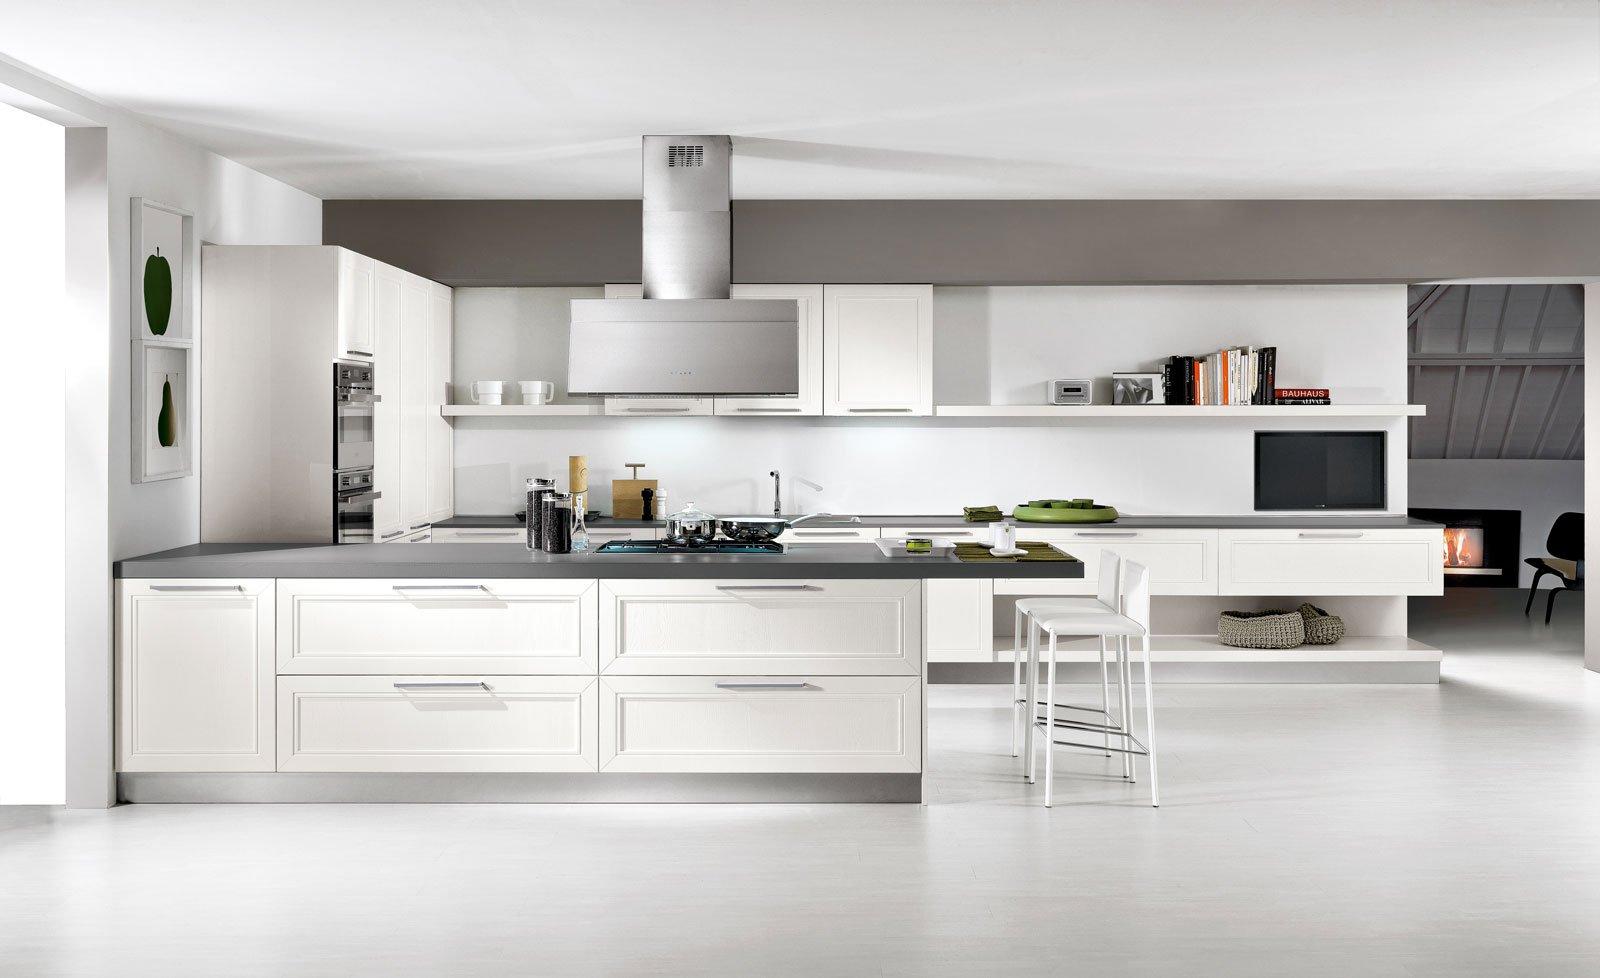 Cucina bianca il fascino eterno della luminosit cose - Cucine belle moderne ...